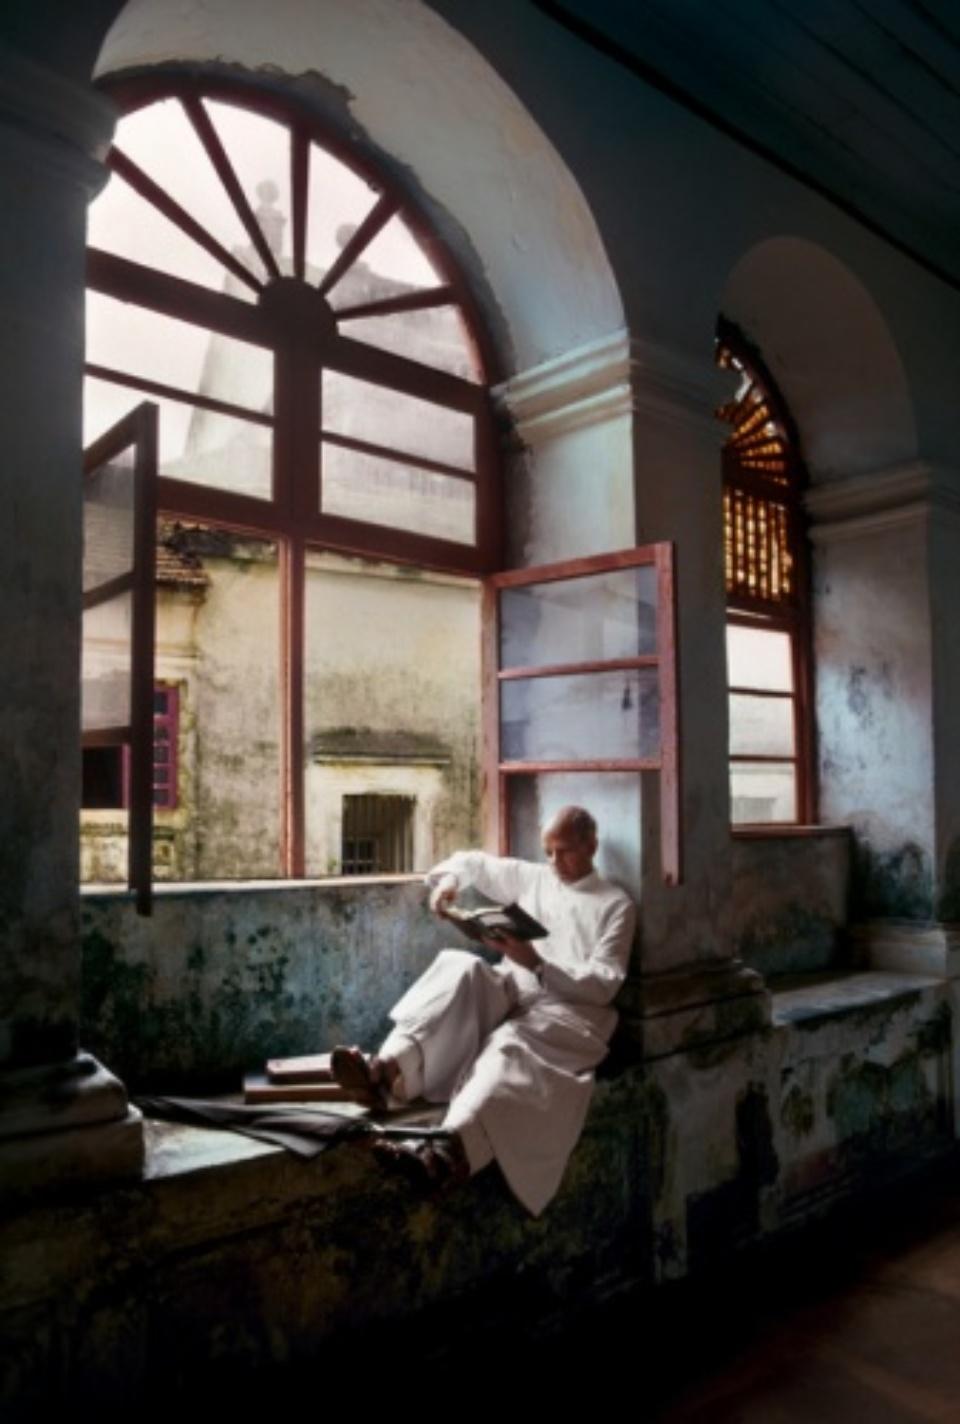 Steve McCurry: Man Reads by Window Goa, India, 1978